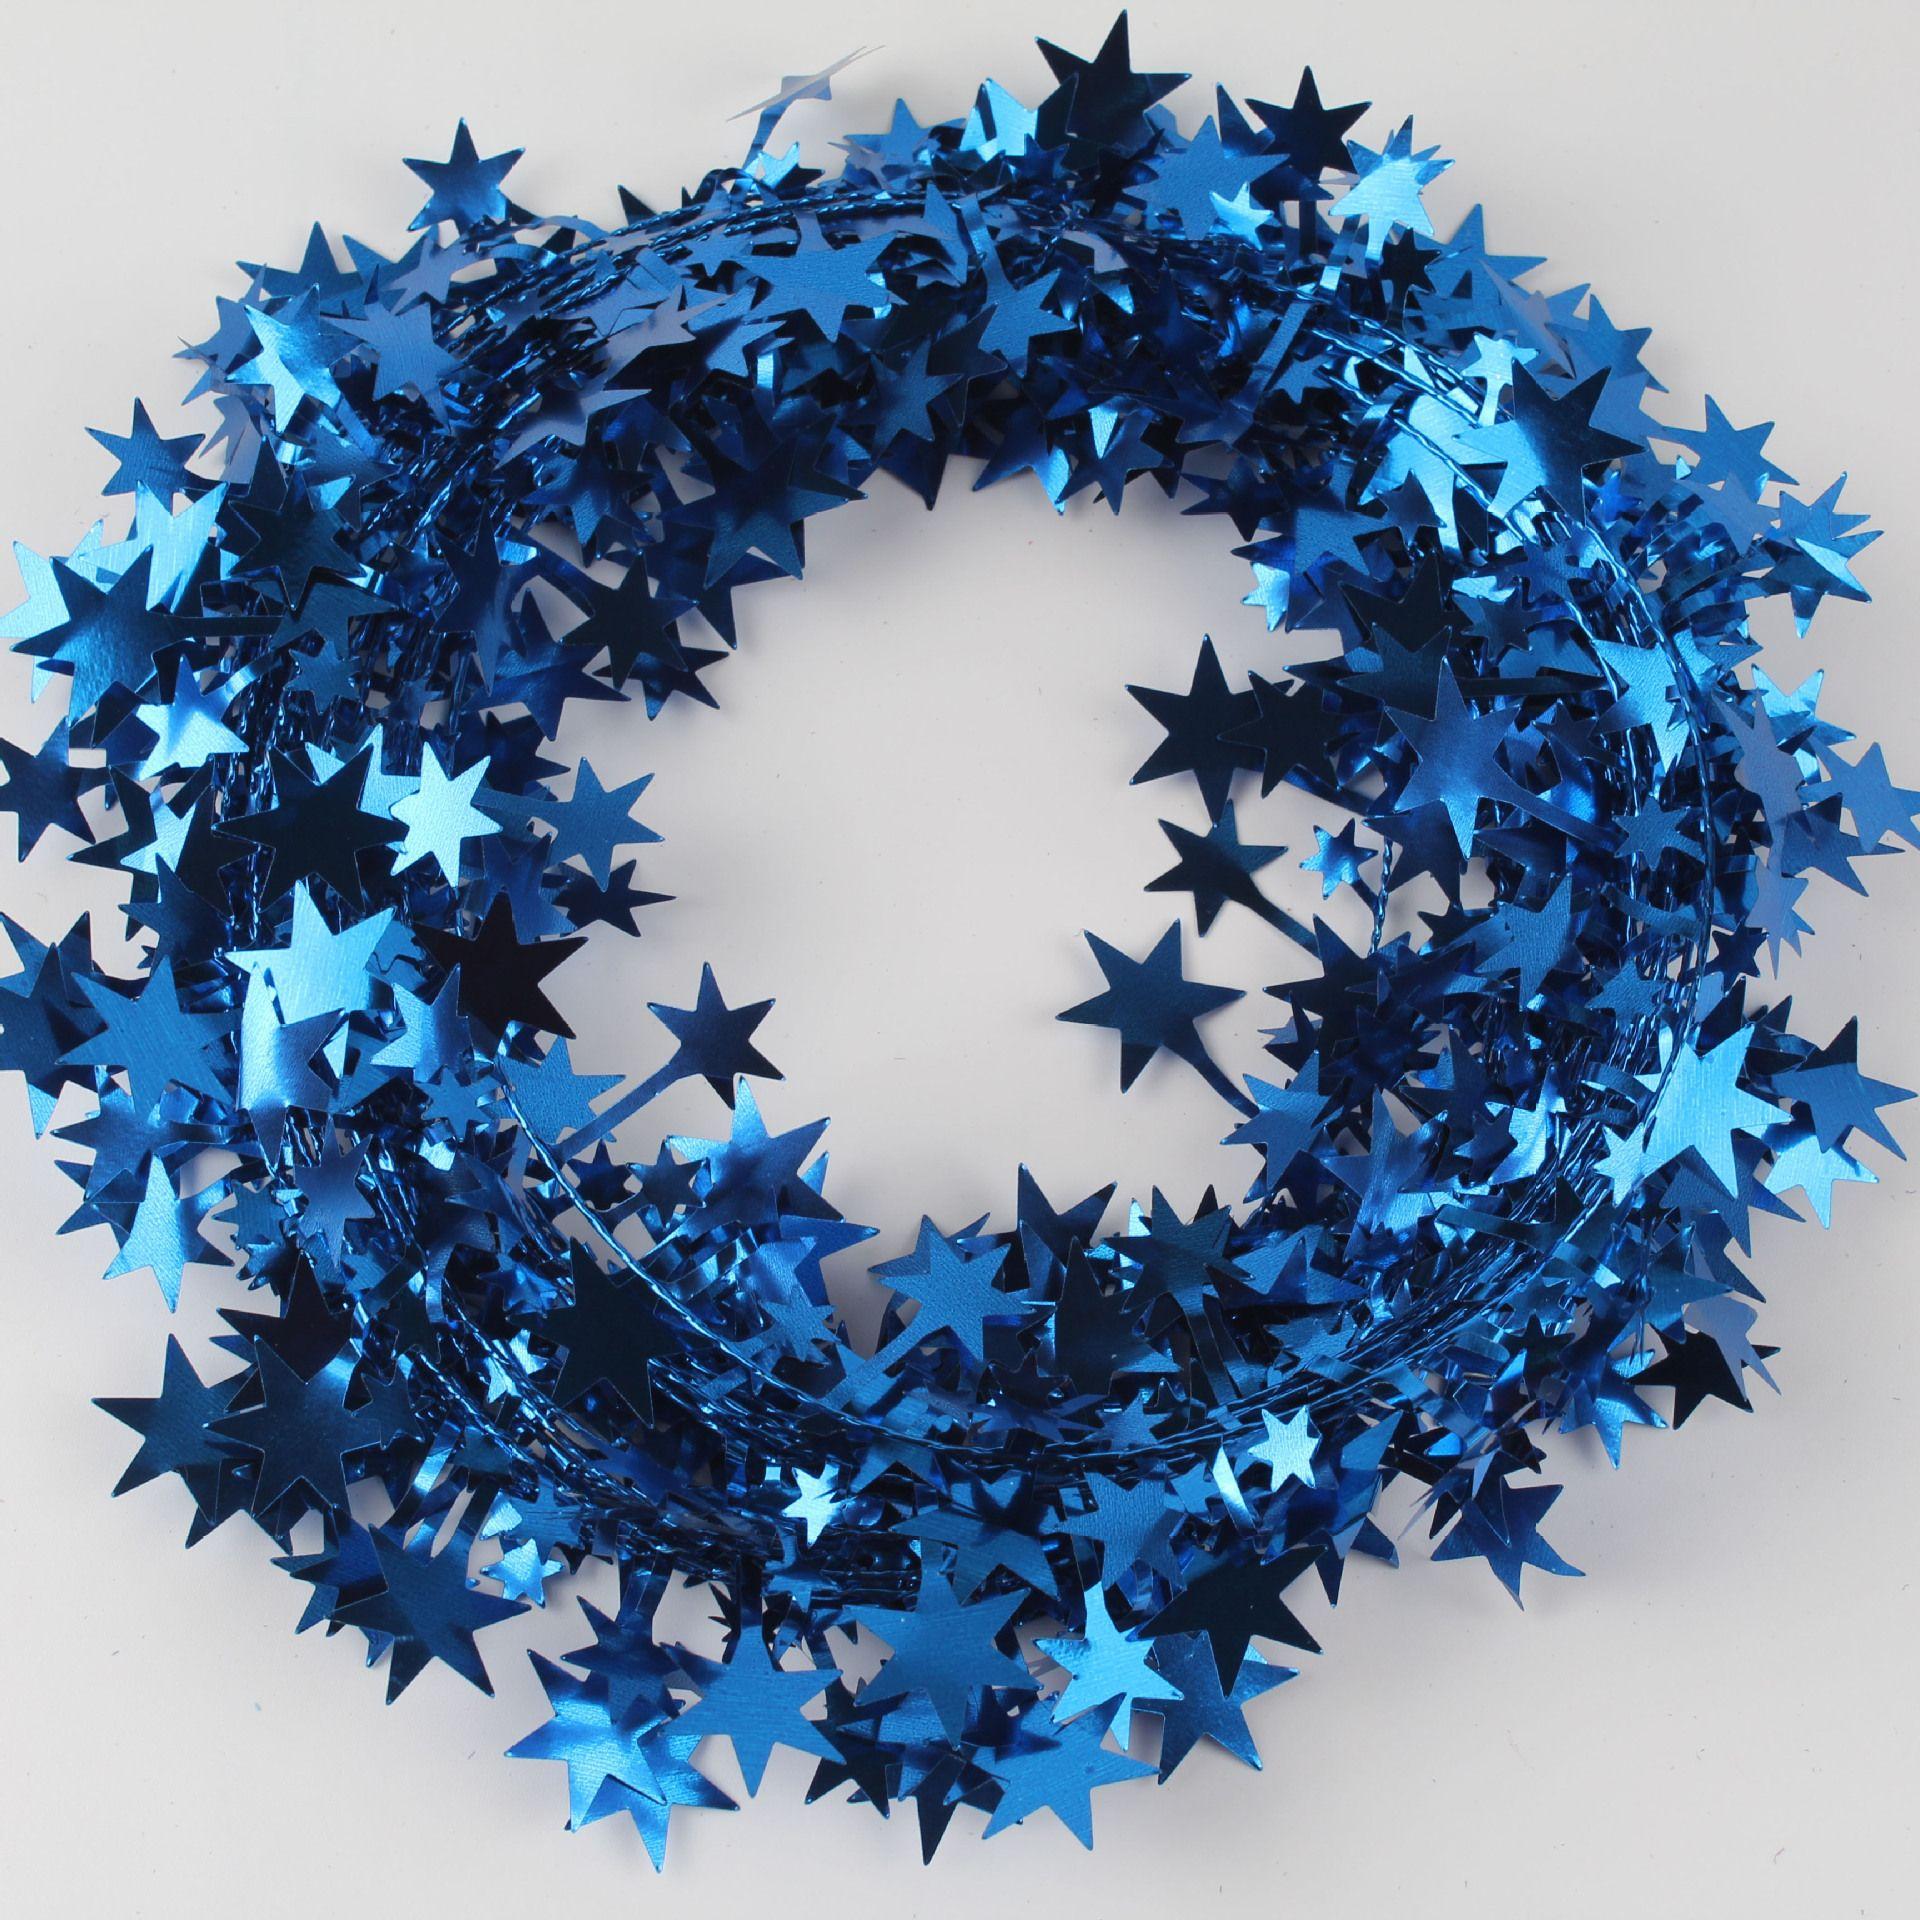 Wired Silver Star Tinsel Garland 50 feet  Wreaths Crafts Party Supplies Weddings